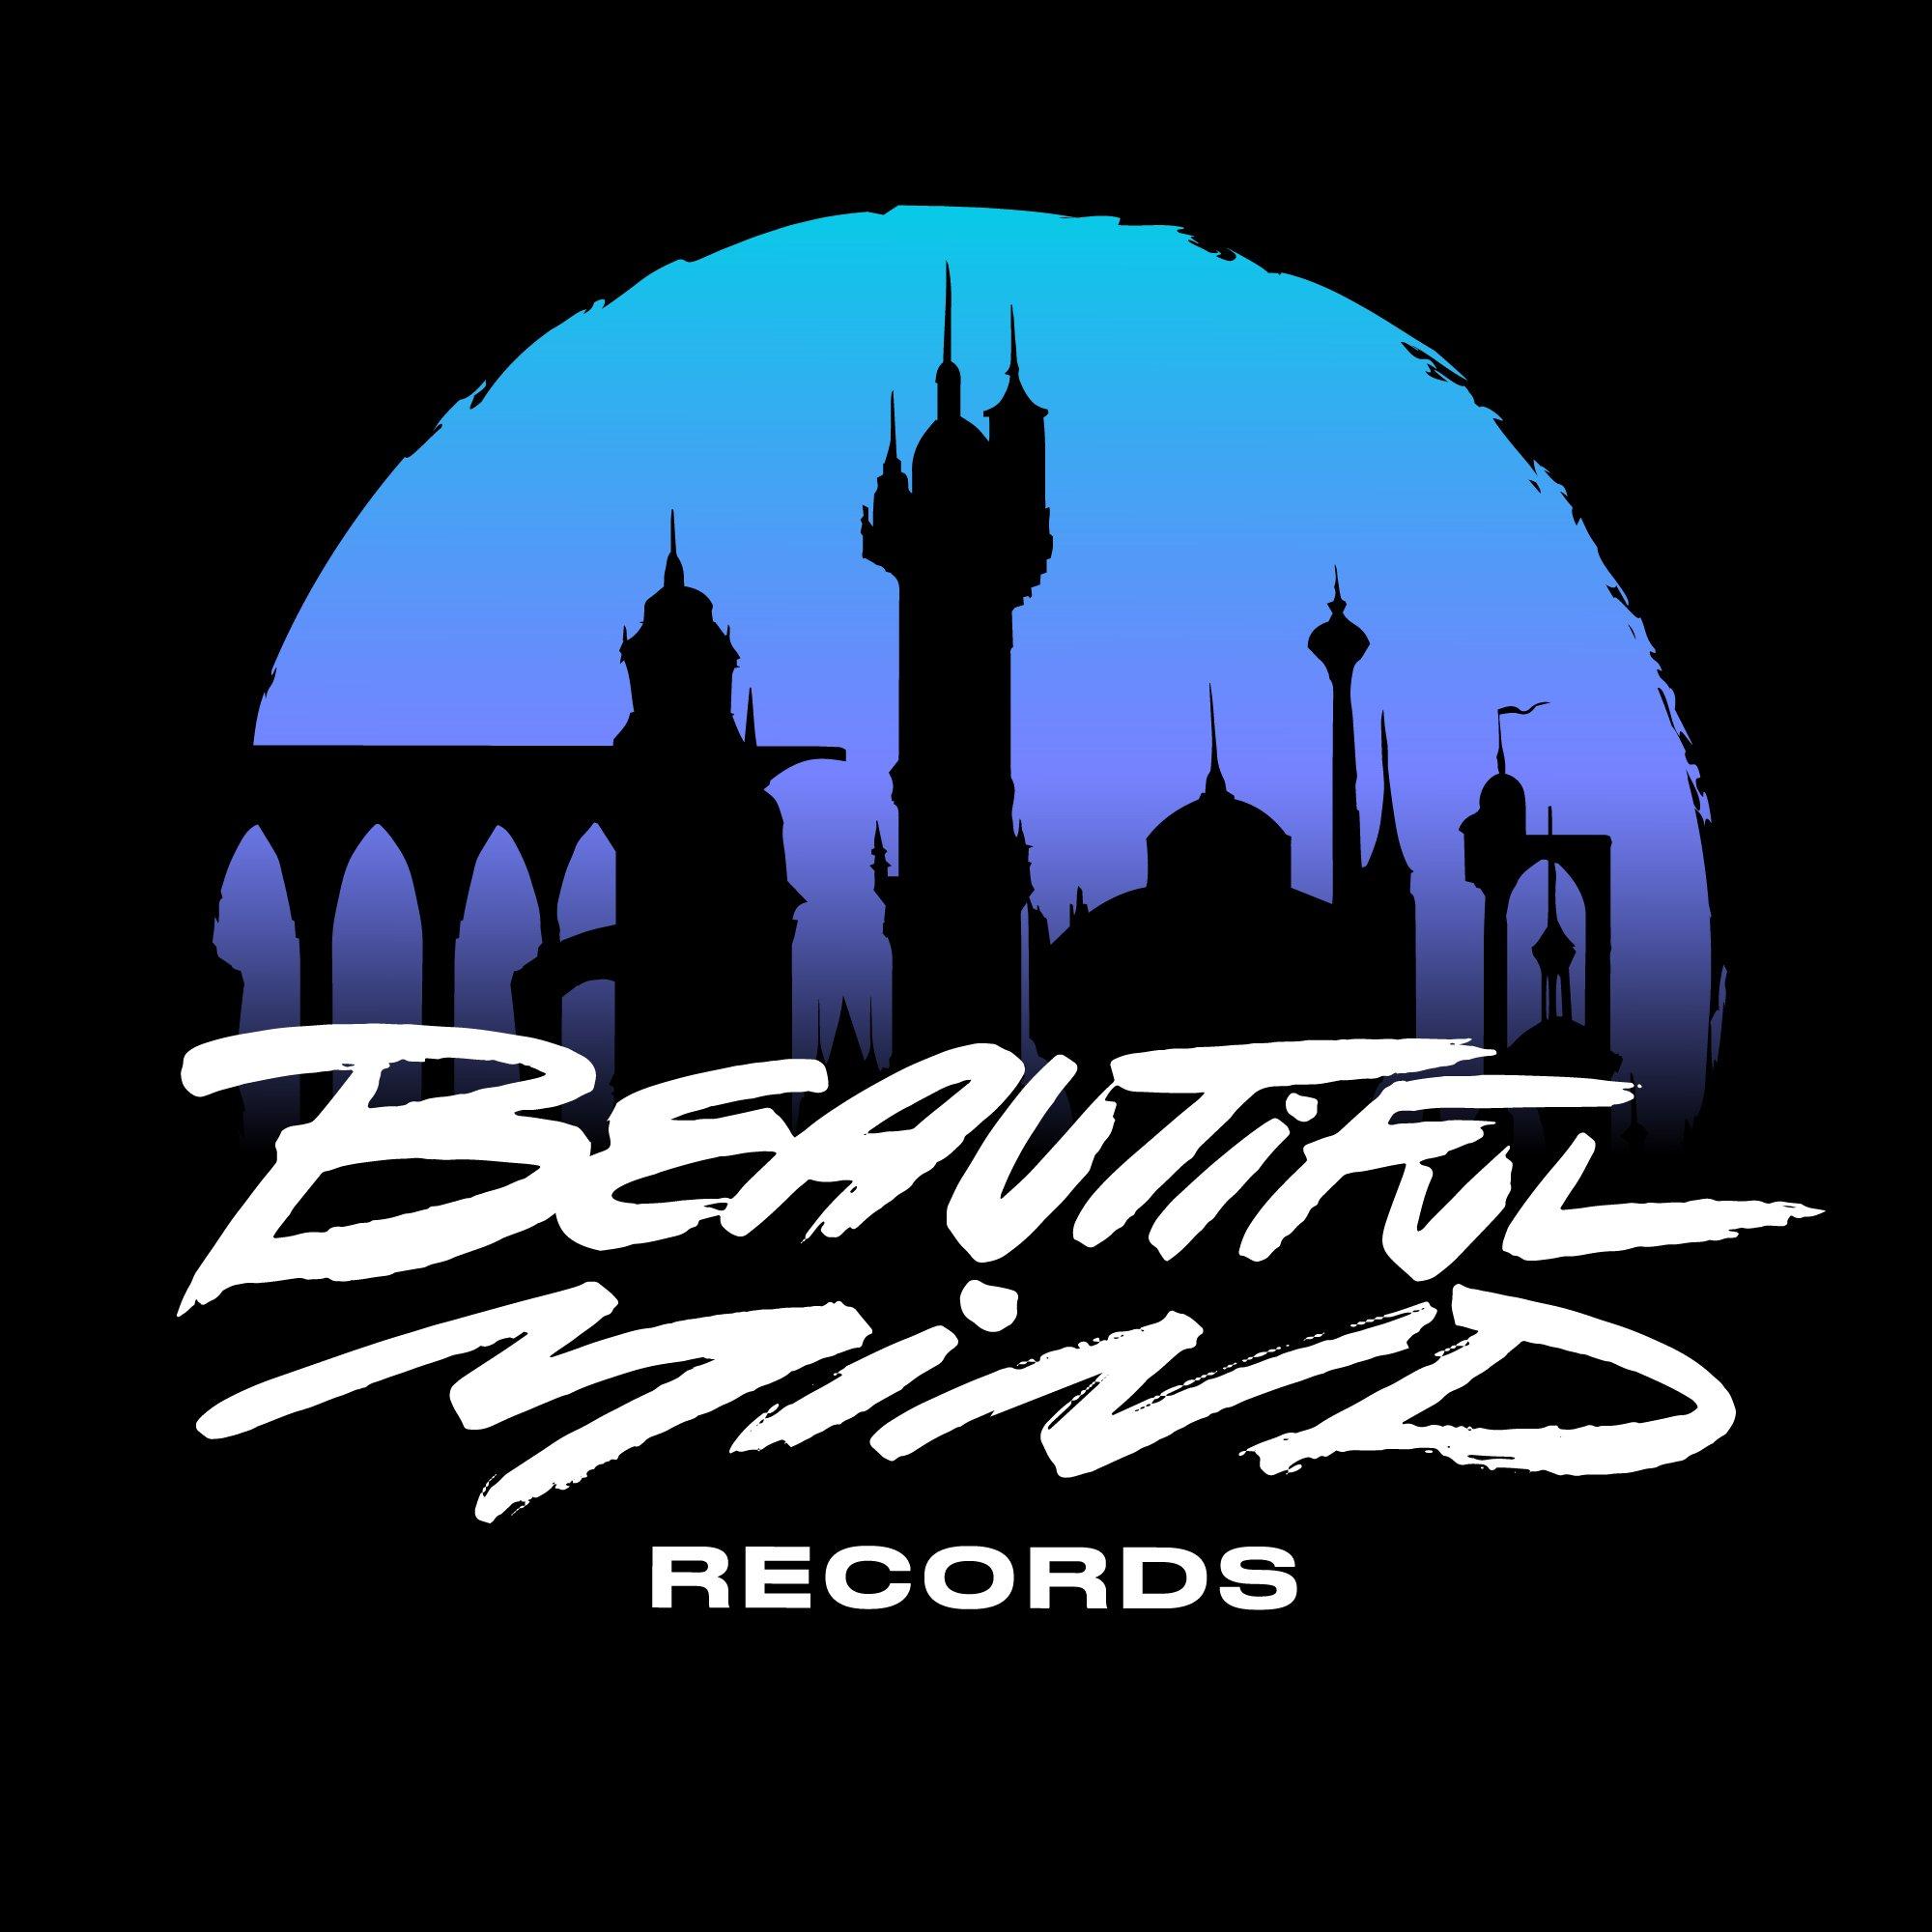 Beautiful Mind Records